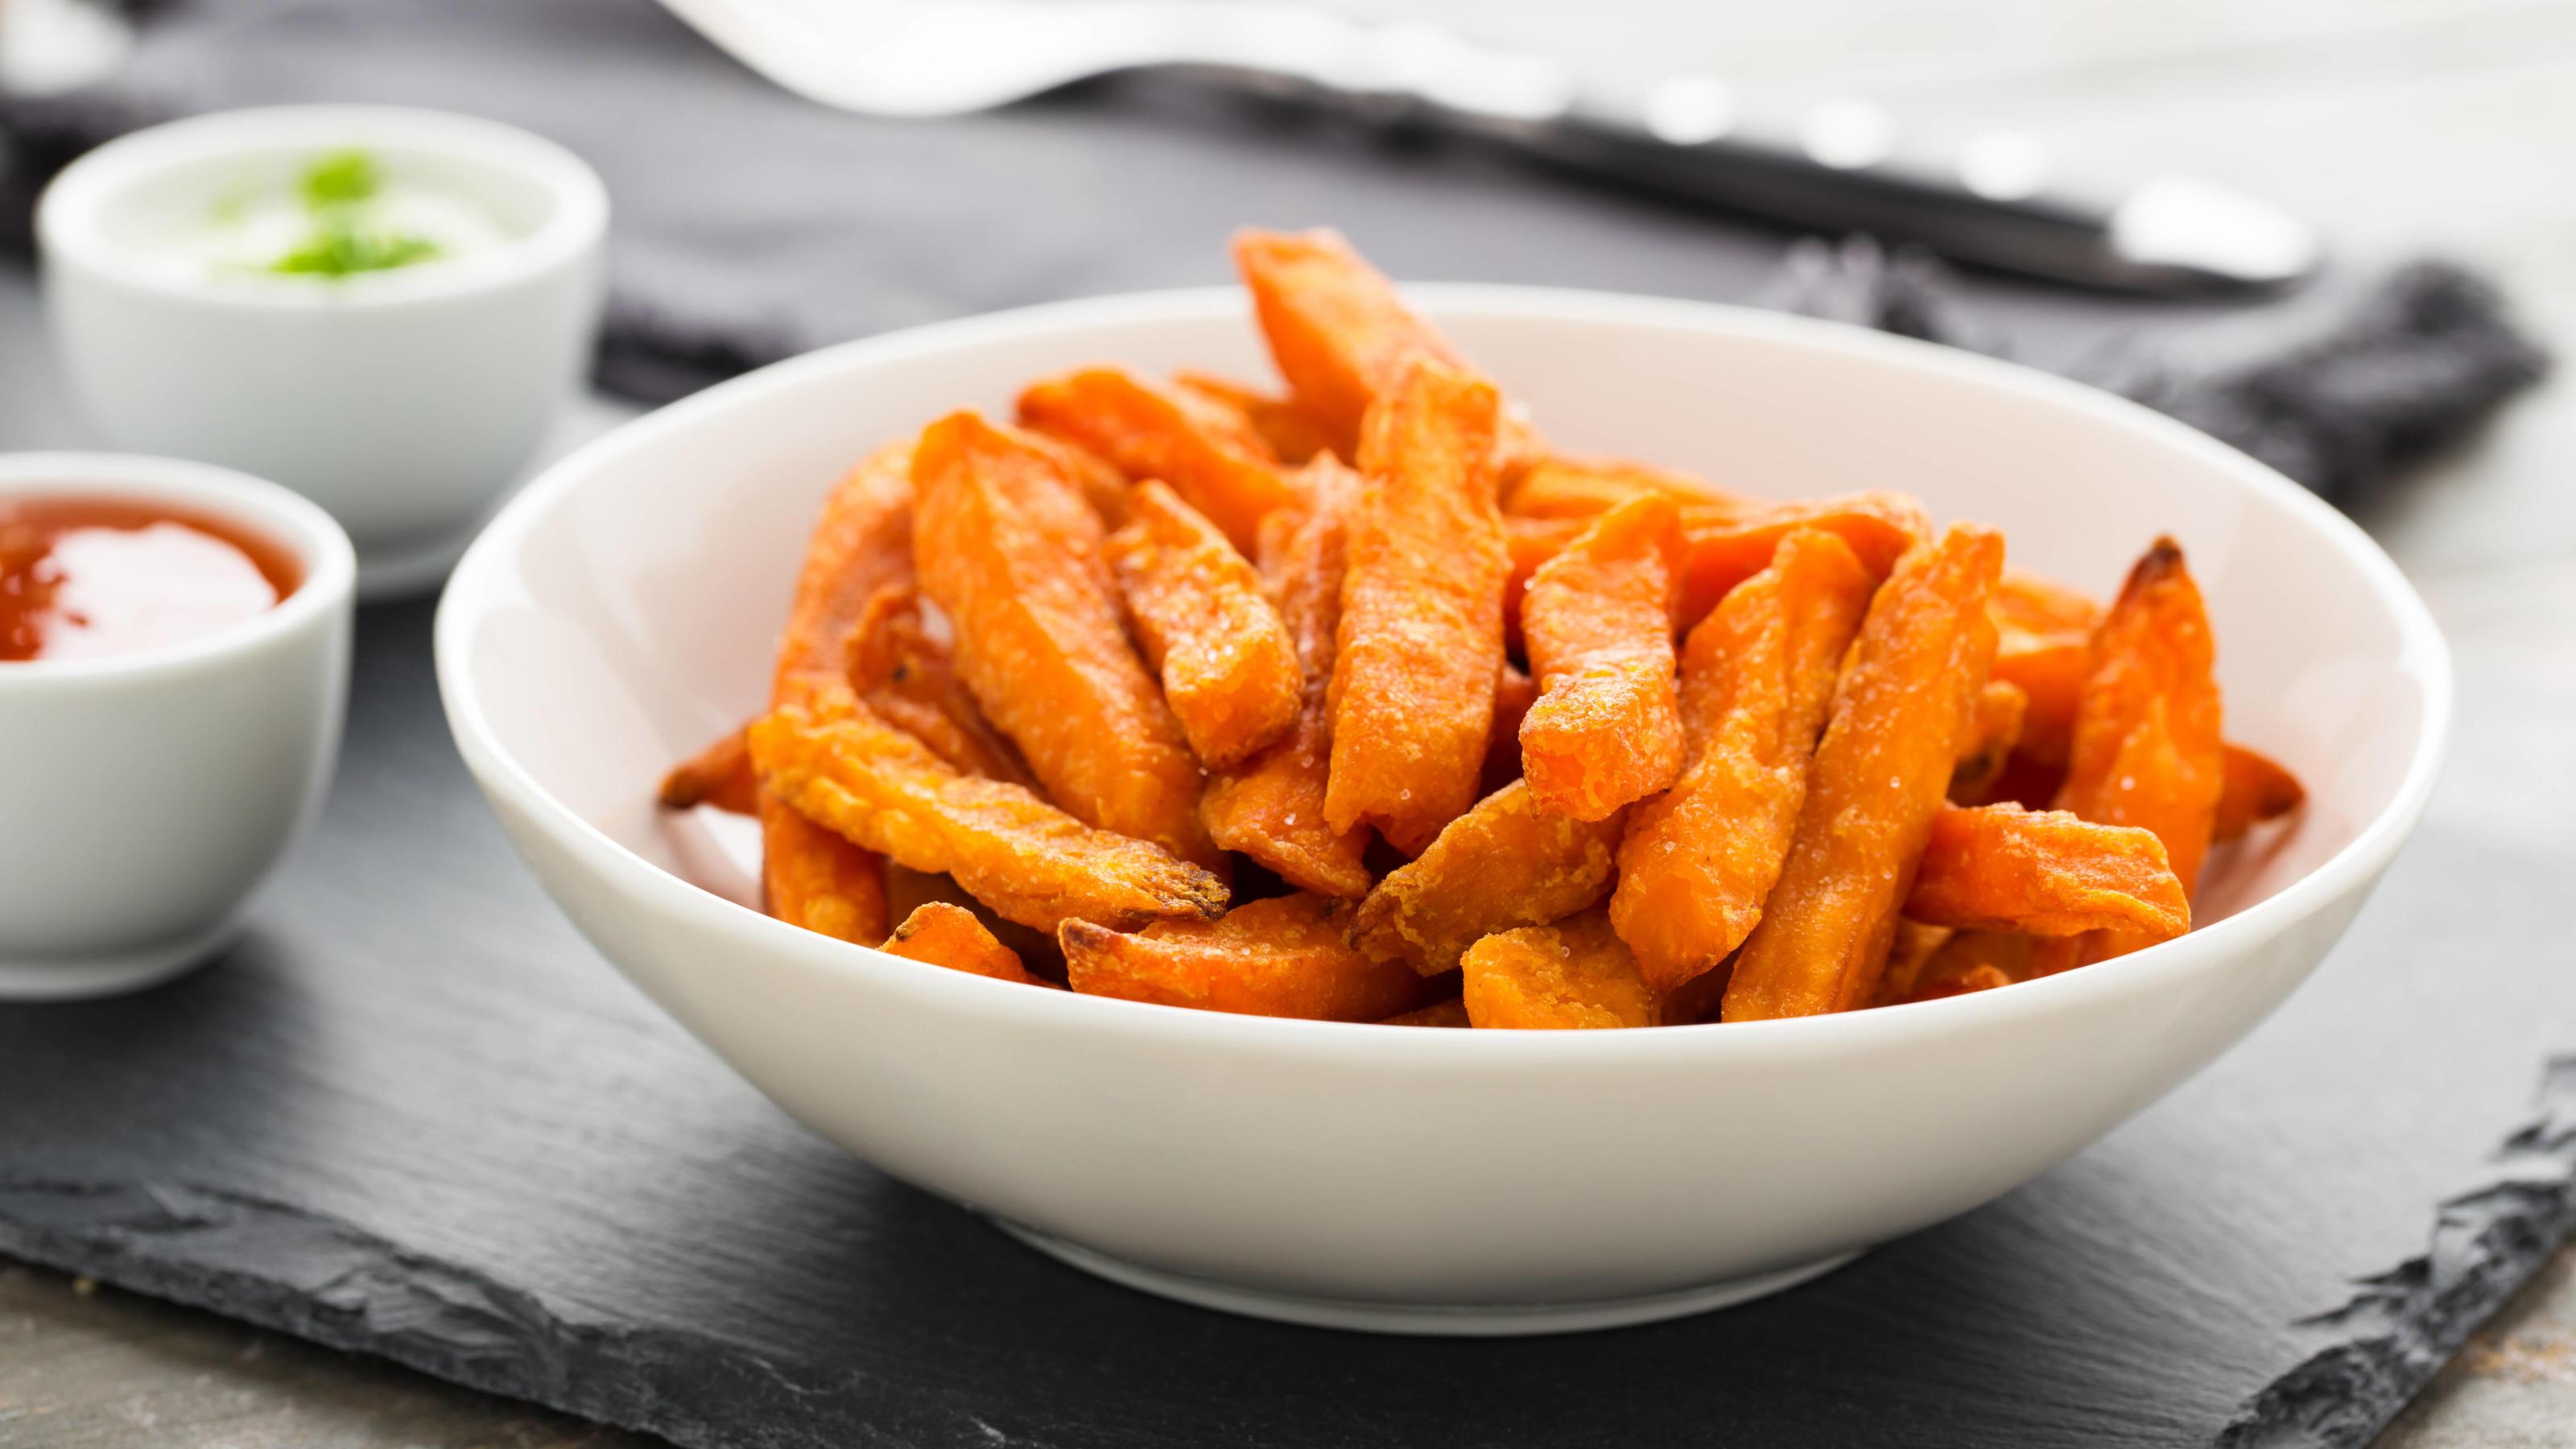 süßkartoffel pommes *** sweet potato fries vvy-fov